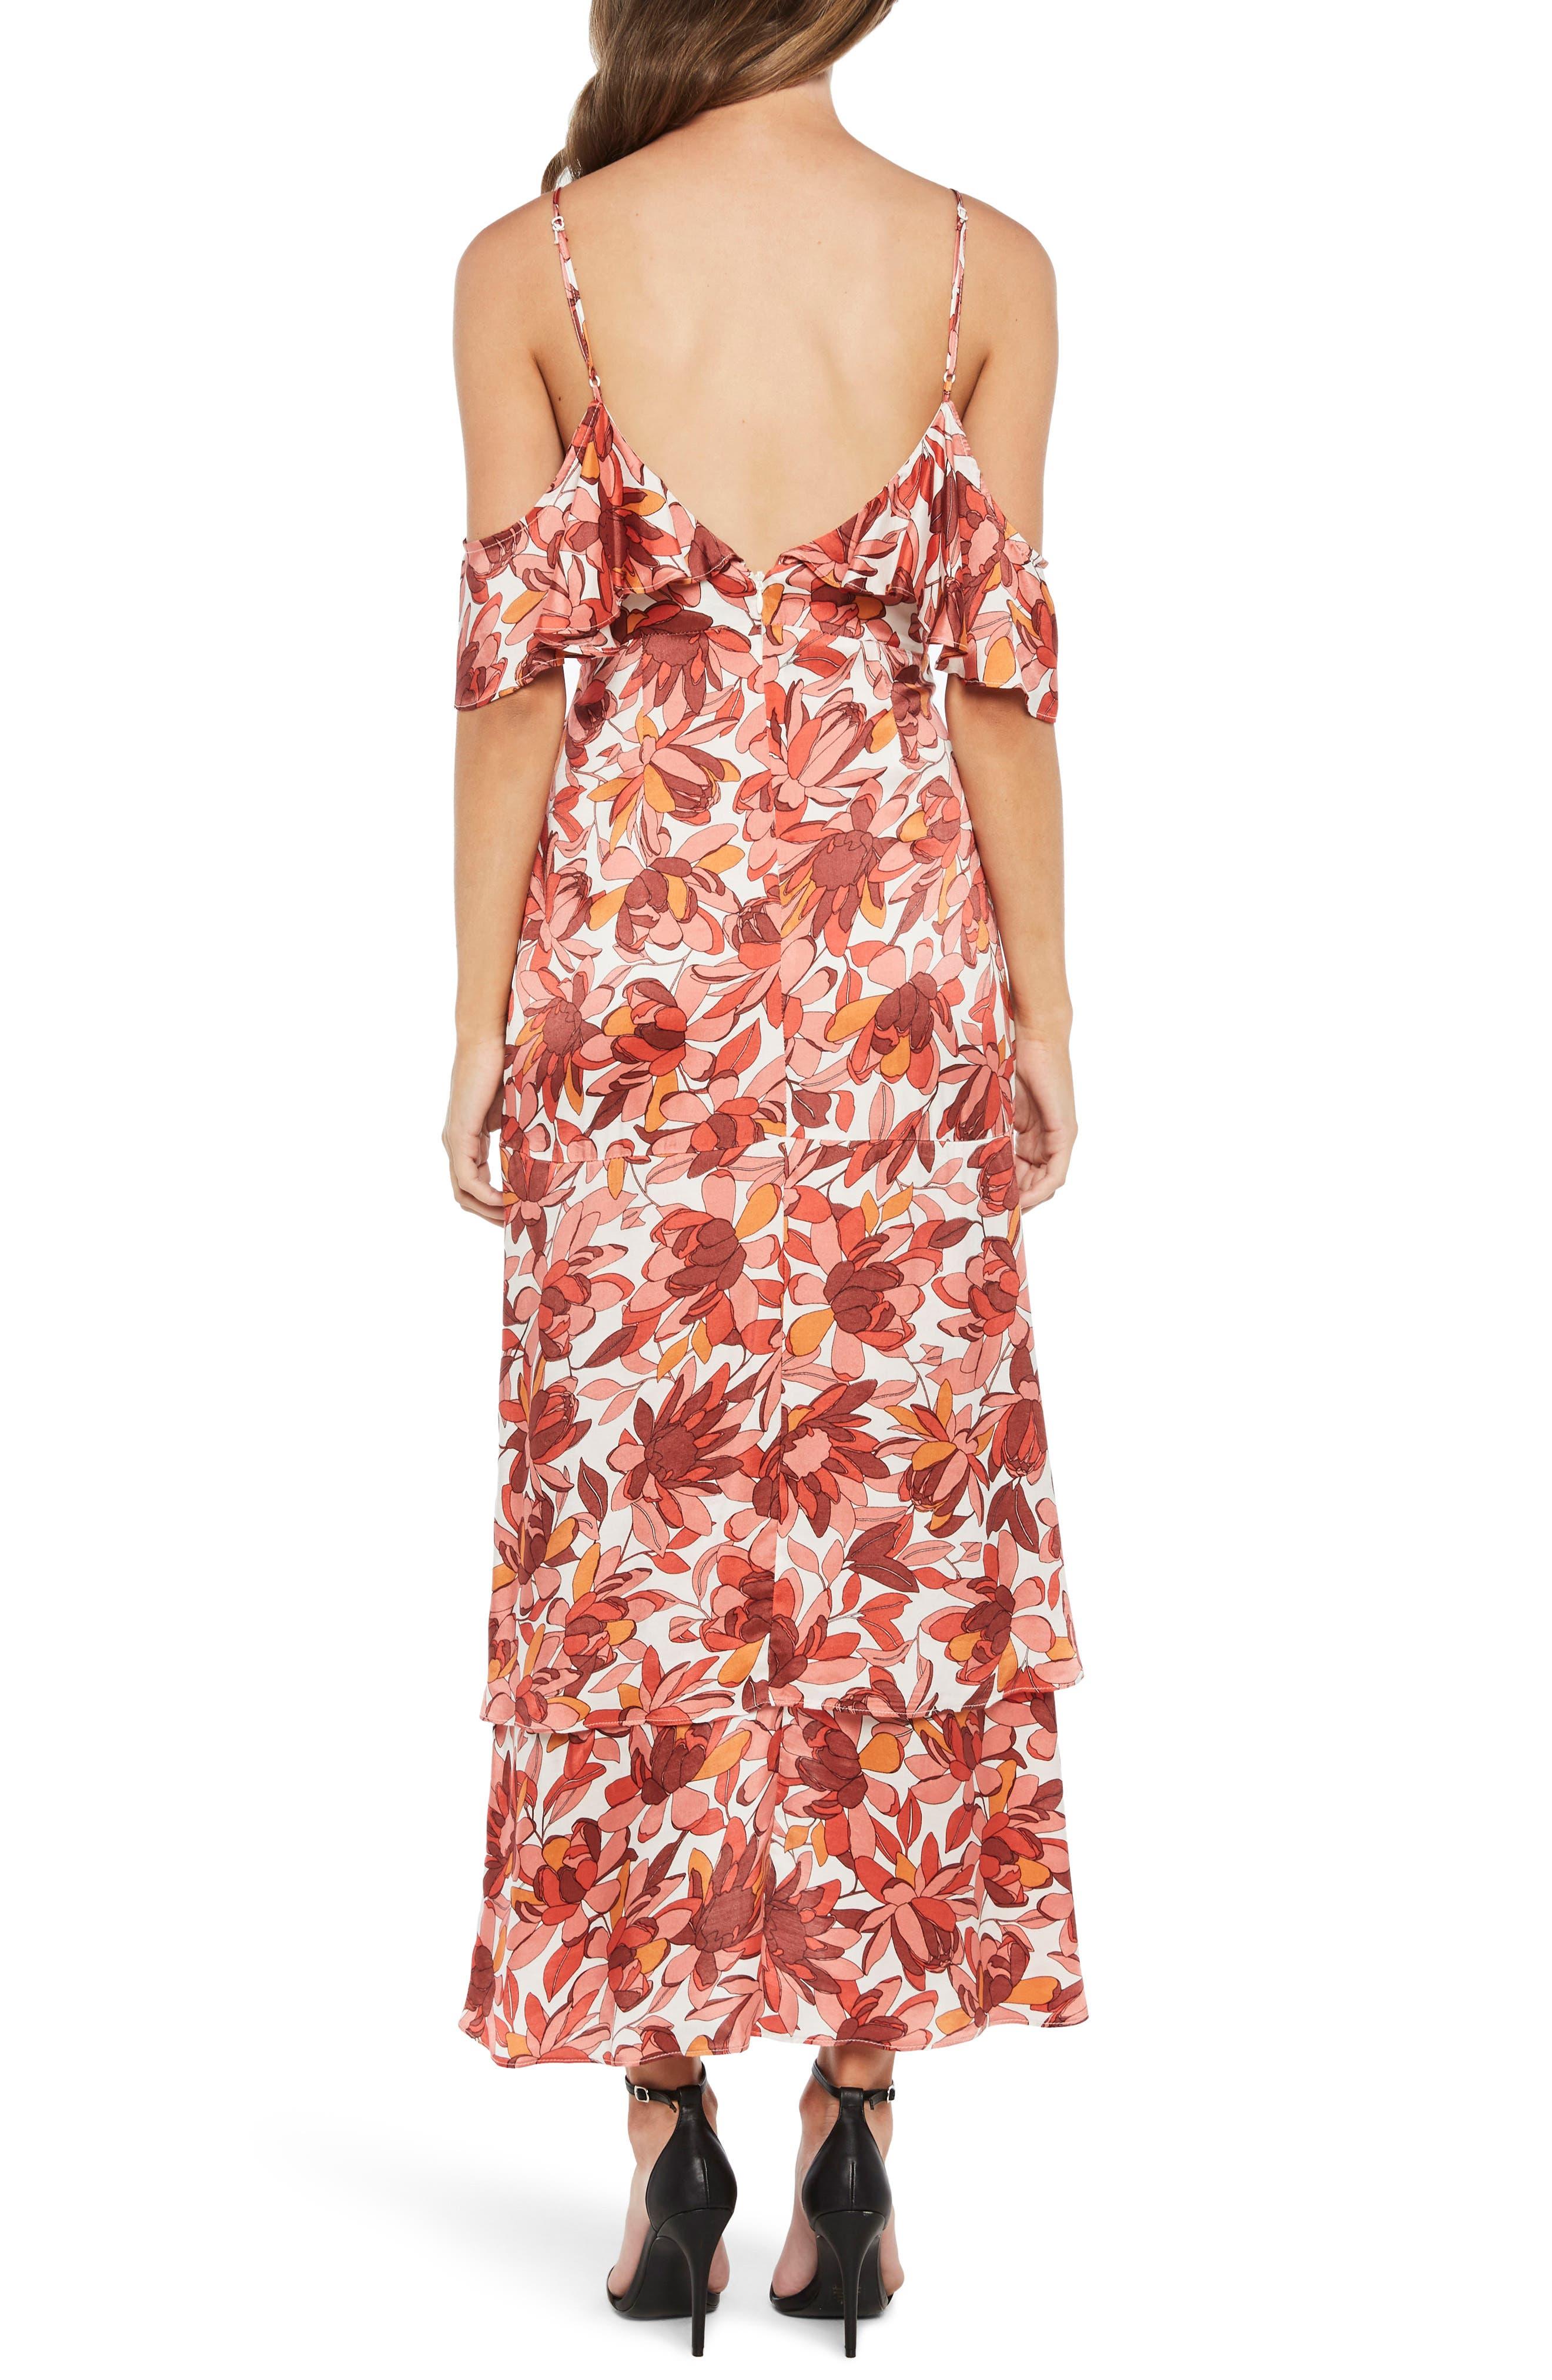 Frankie Frill Floral Dress,                             Alternate thumbnail 3, color,                             Azr Floral